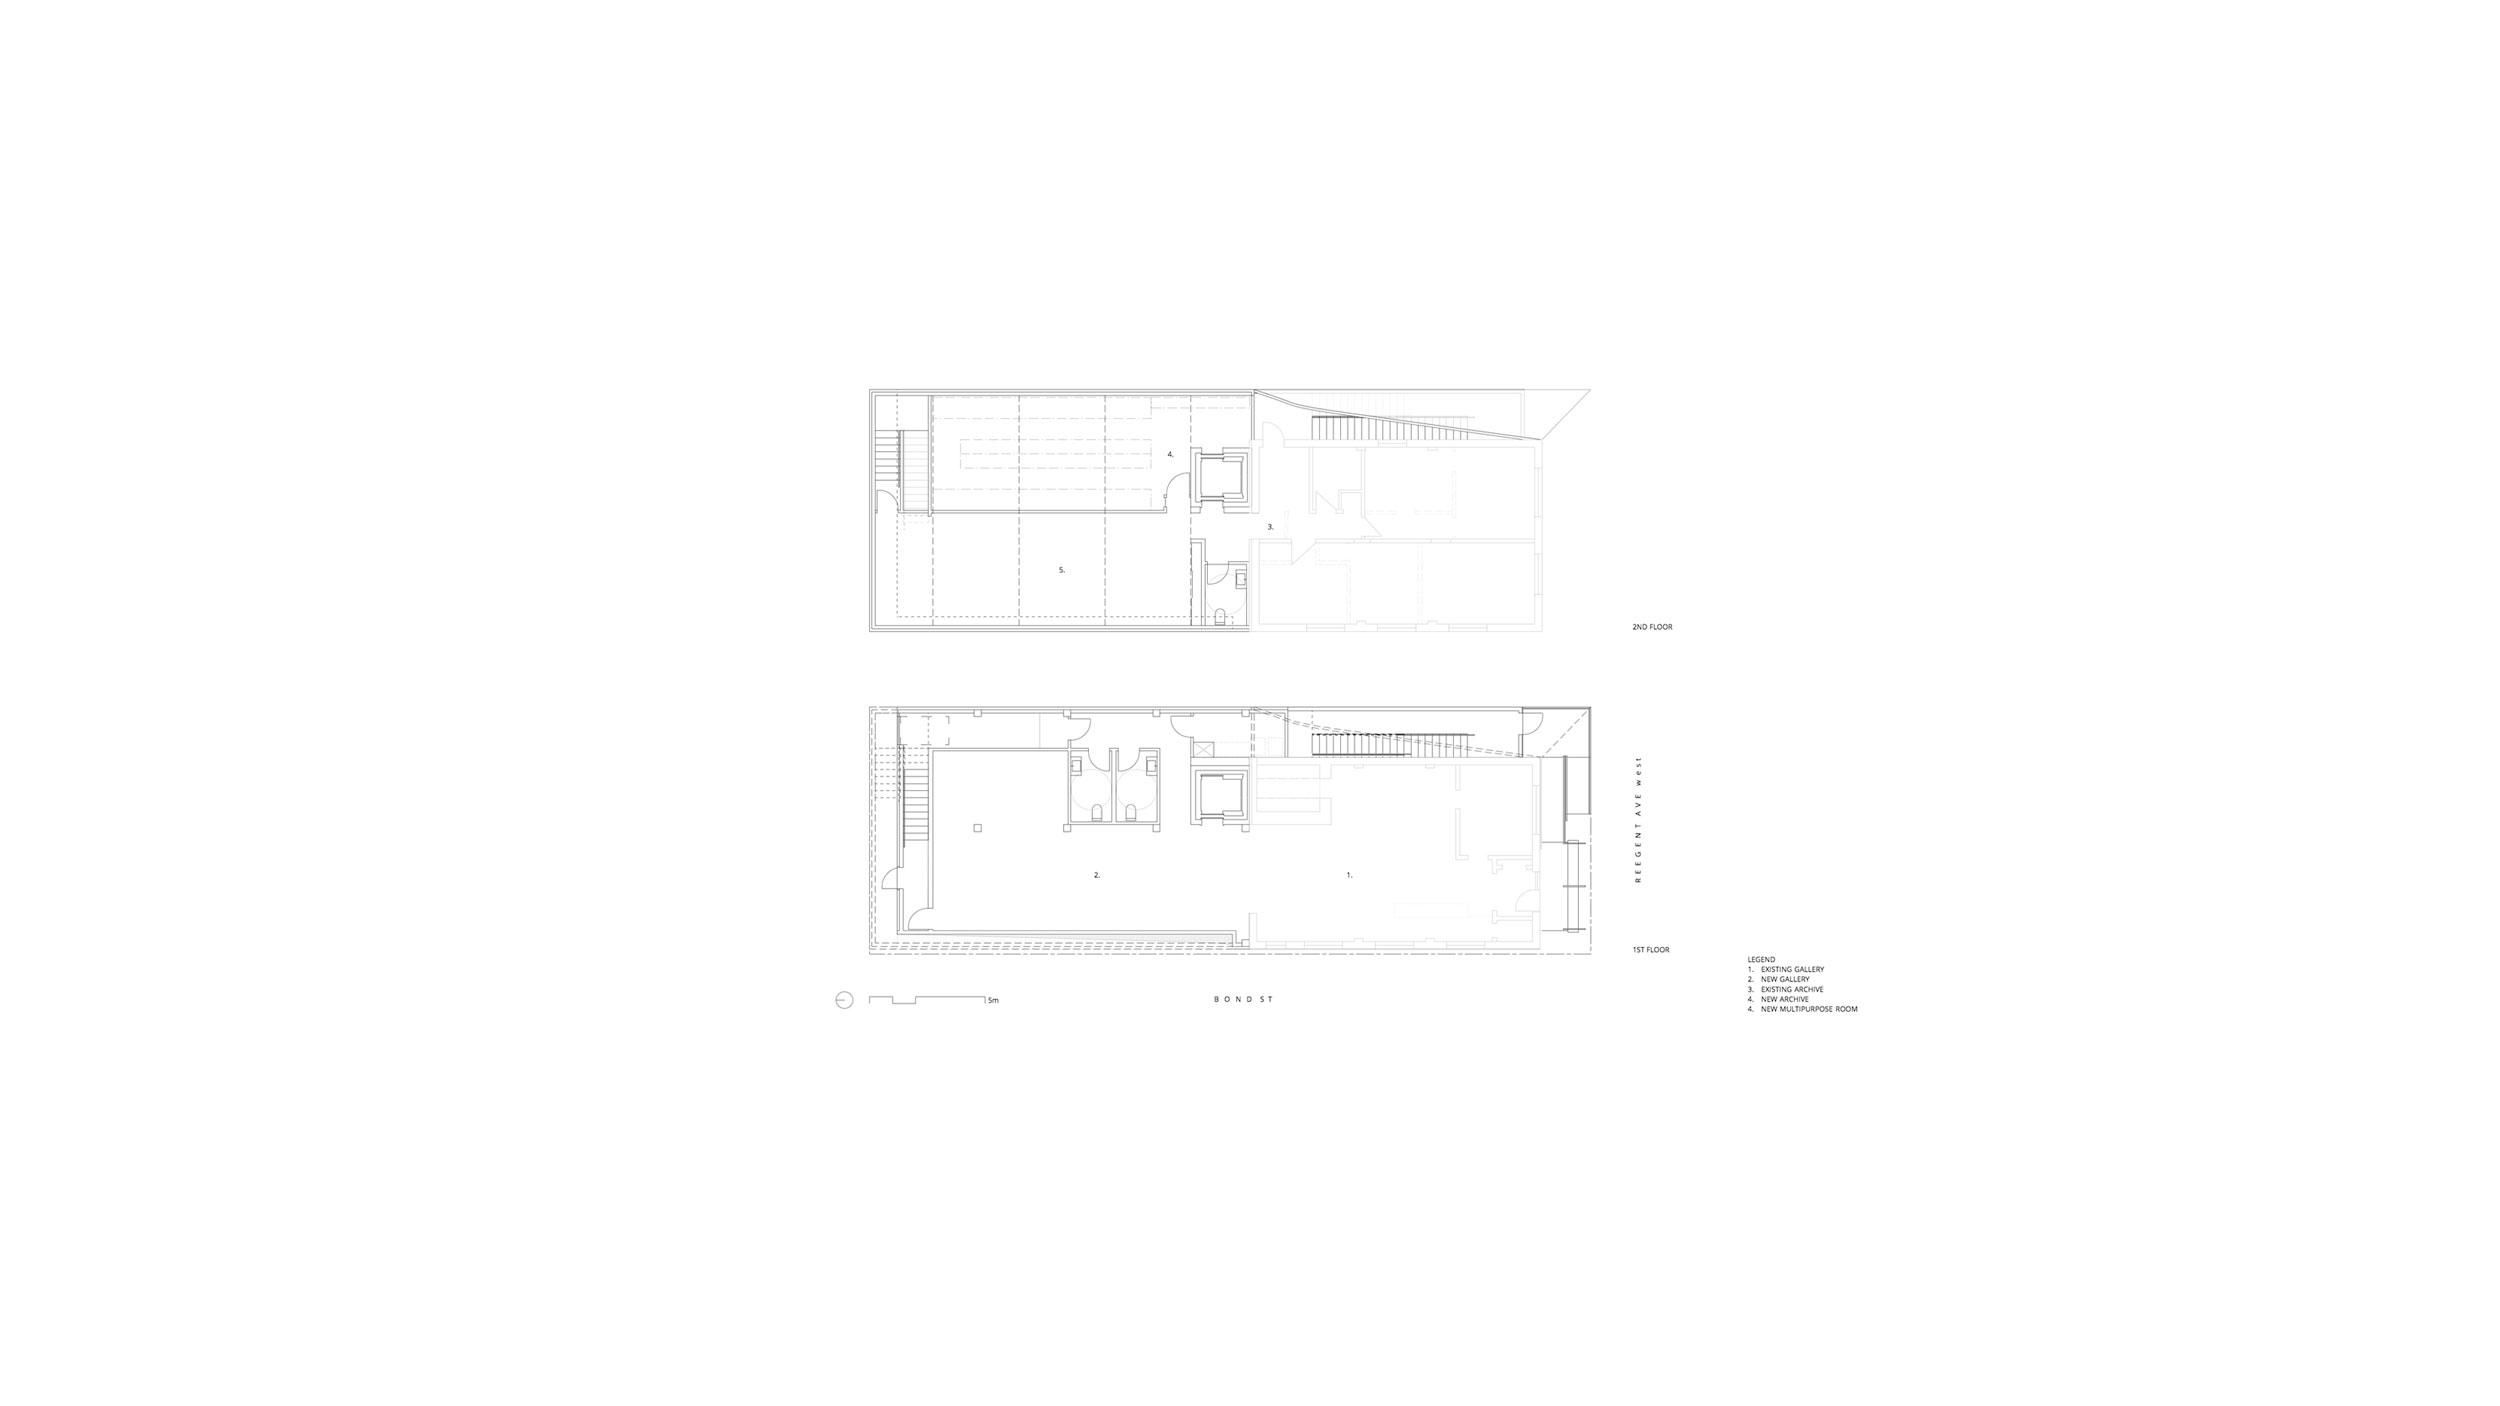 atlrg_transmuseum_plan_1.0_12.04.19.jpg